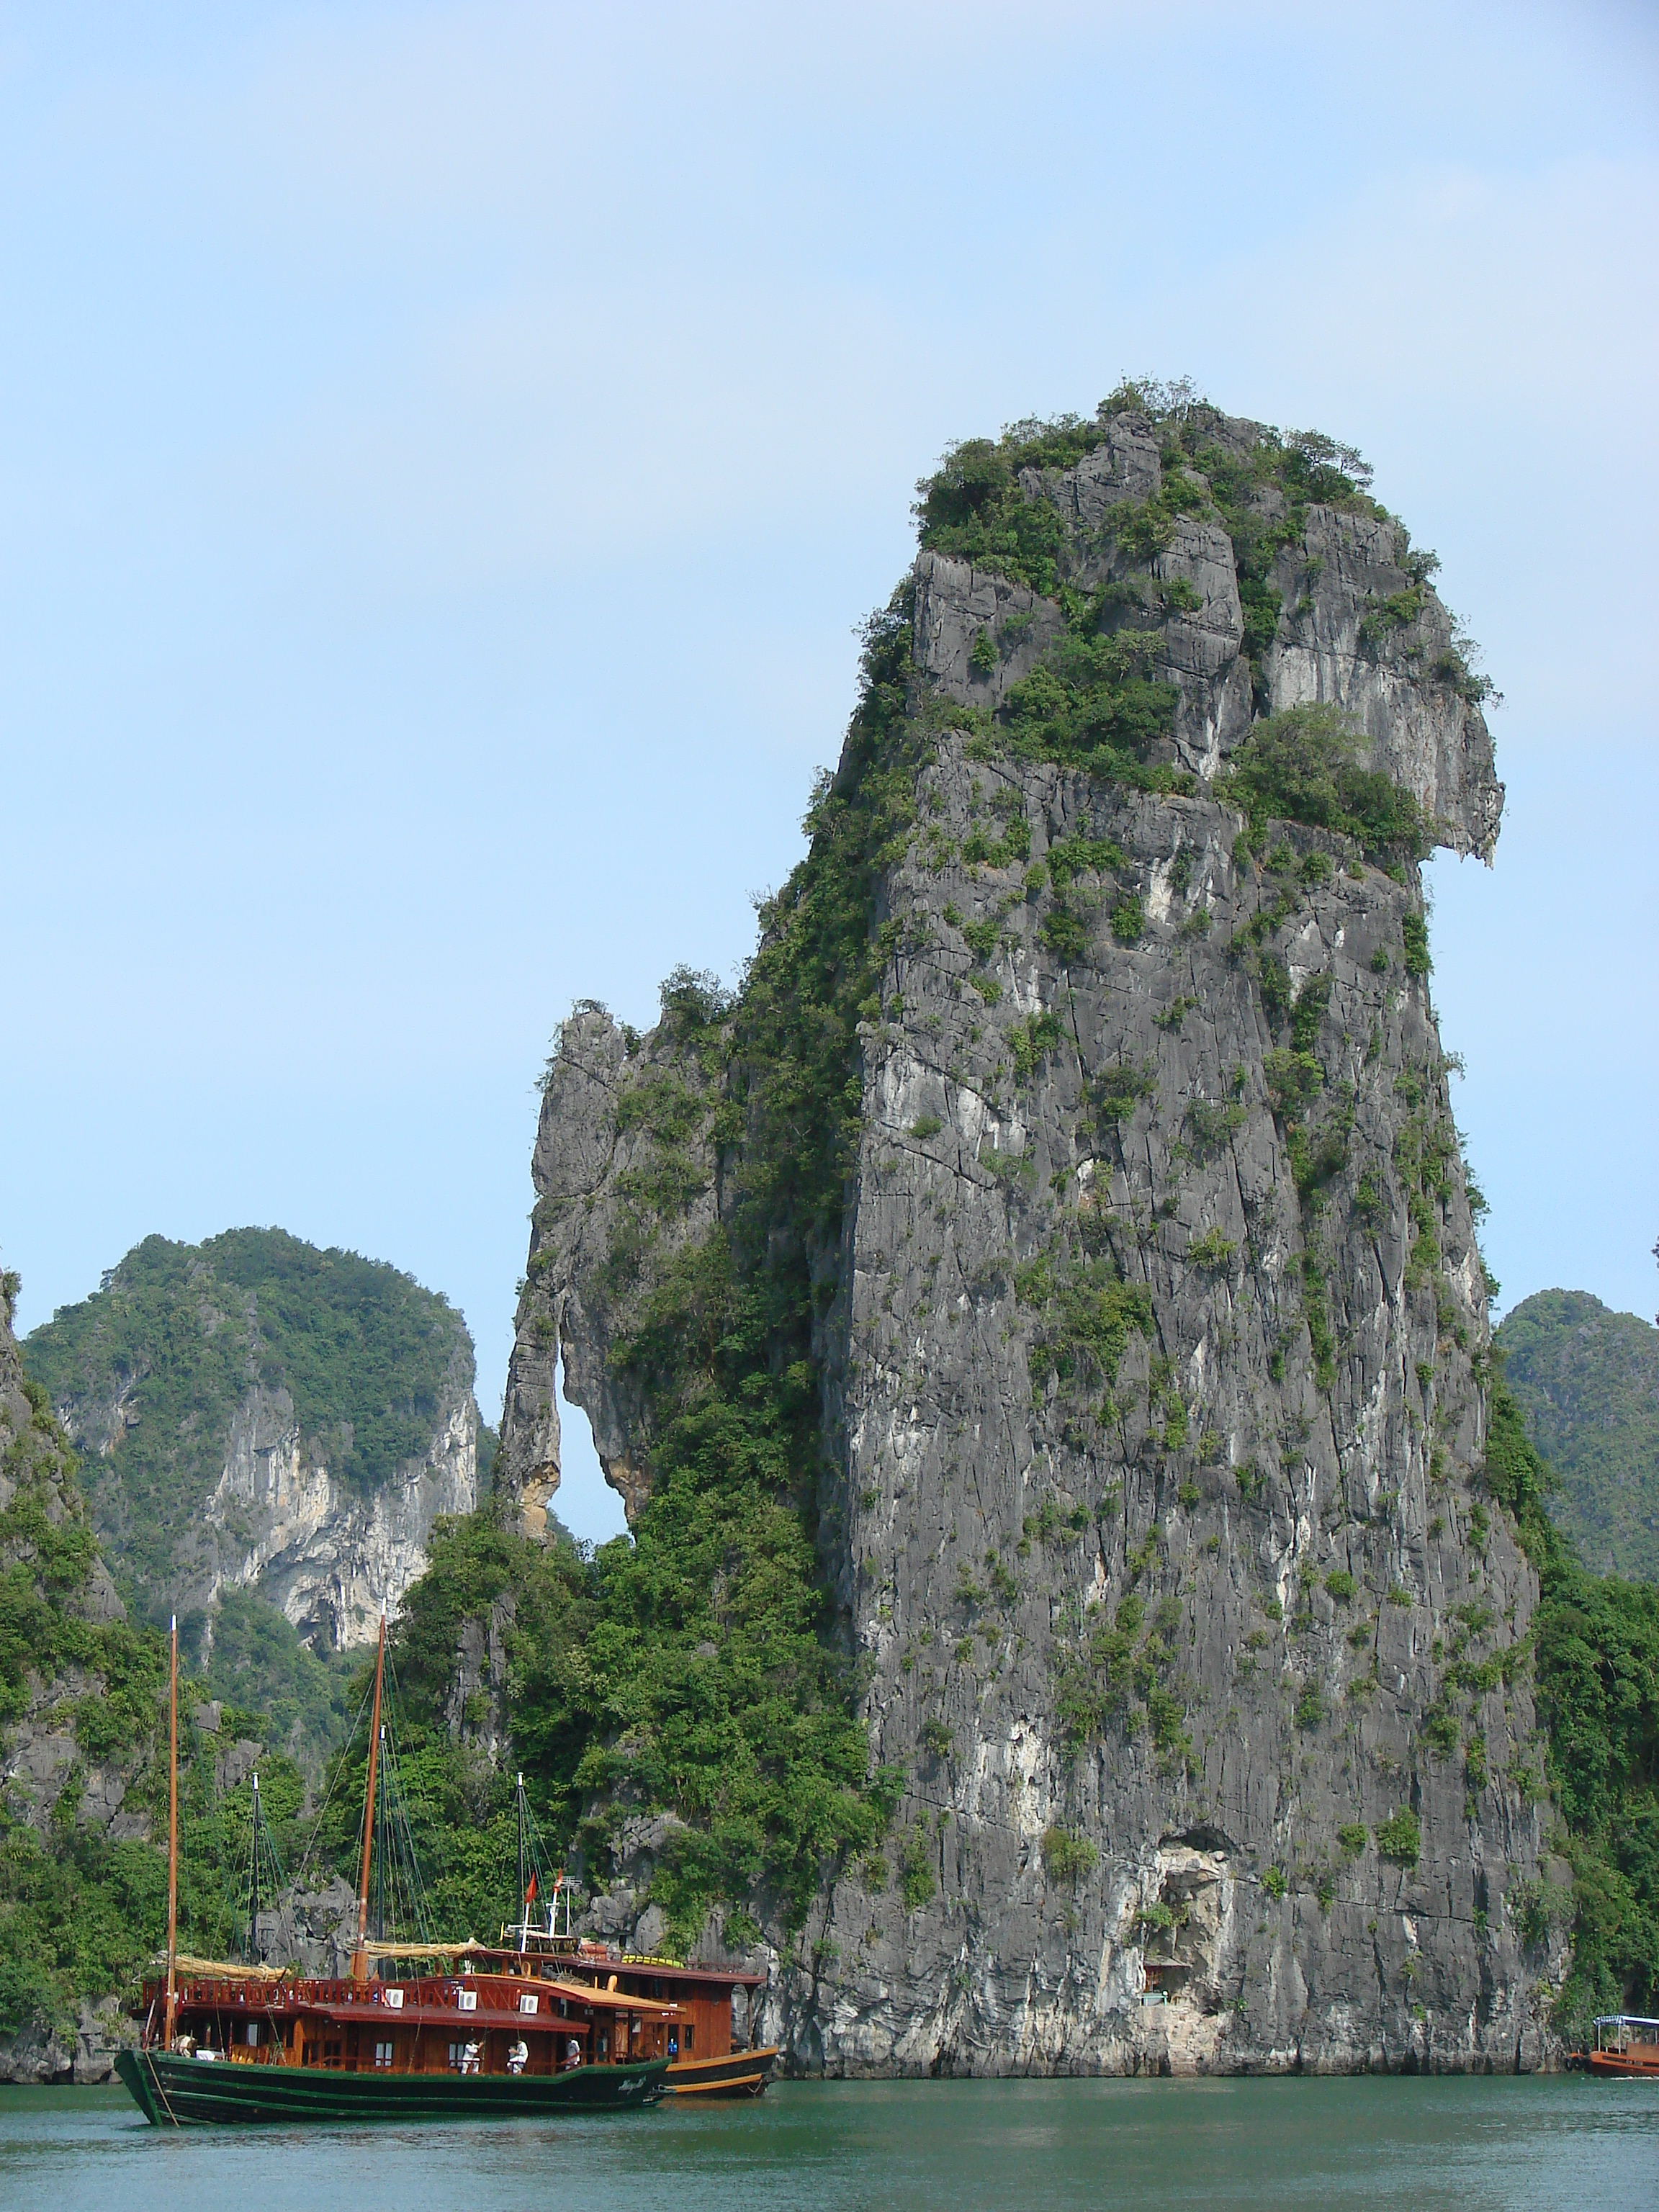 Halong Vietnam  city pictures gallery : Description Halong Bay Vietnam 02